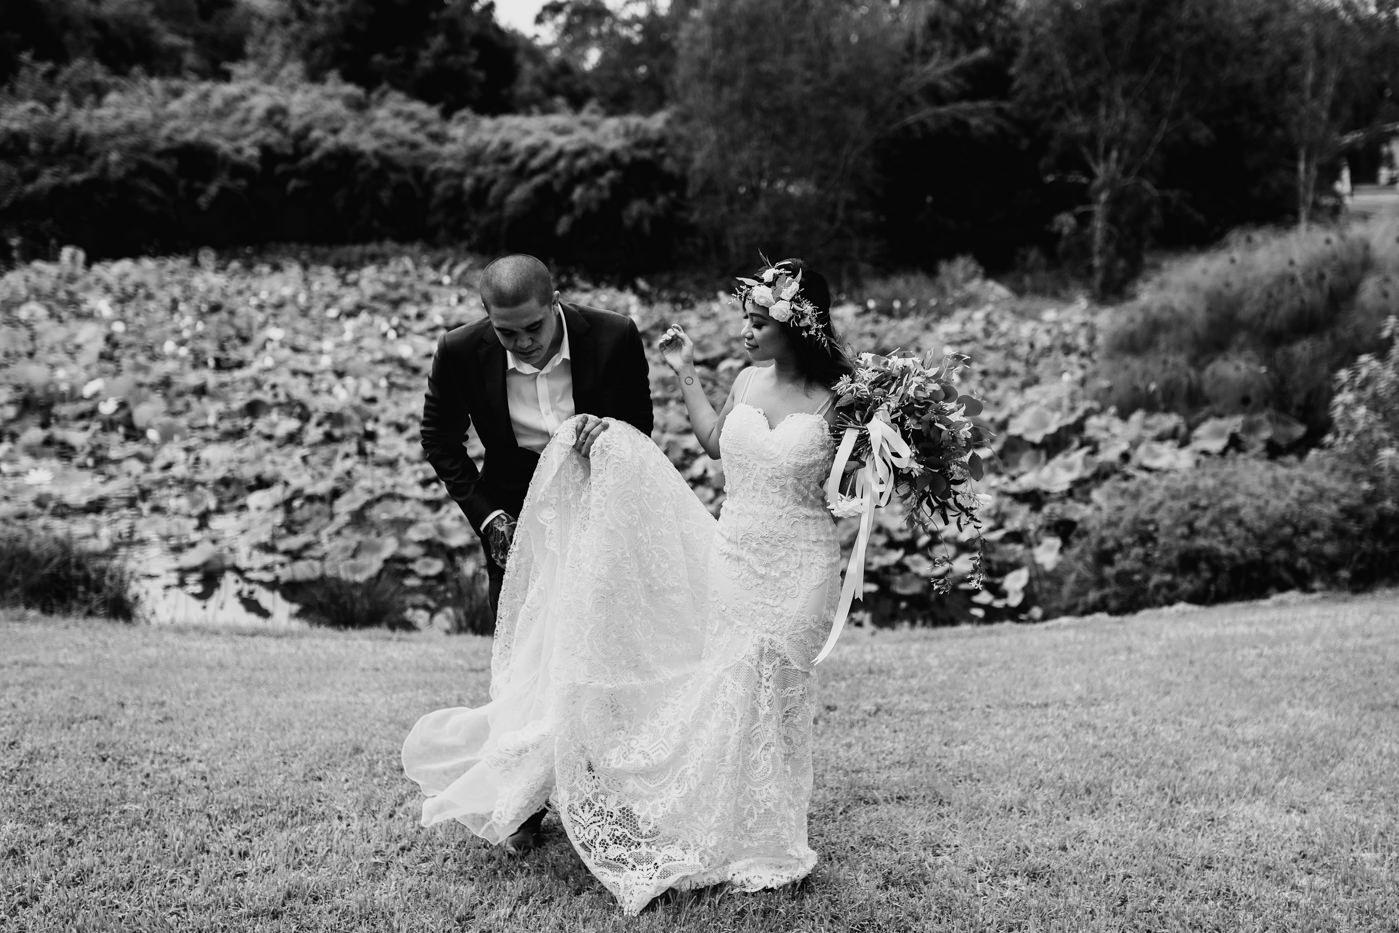 Nick & Vanezza - Fernbank Farm Wedding - Samantha Heather Photography-89.jpg